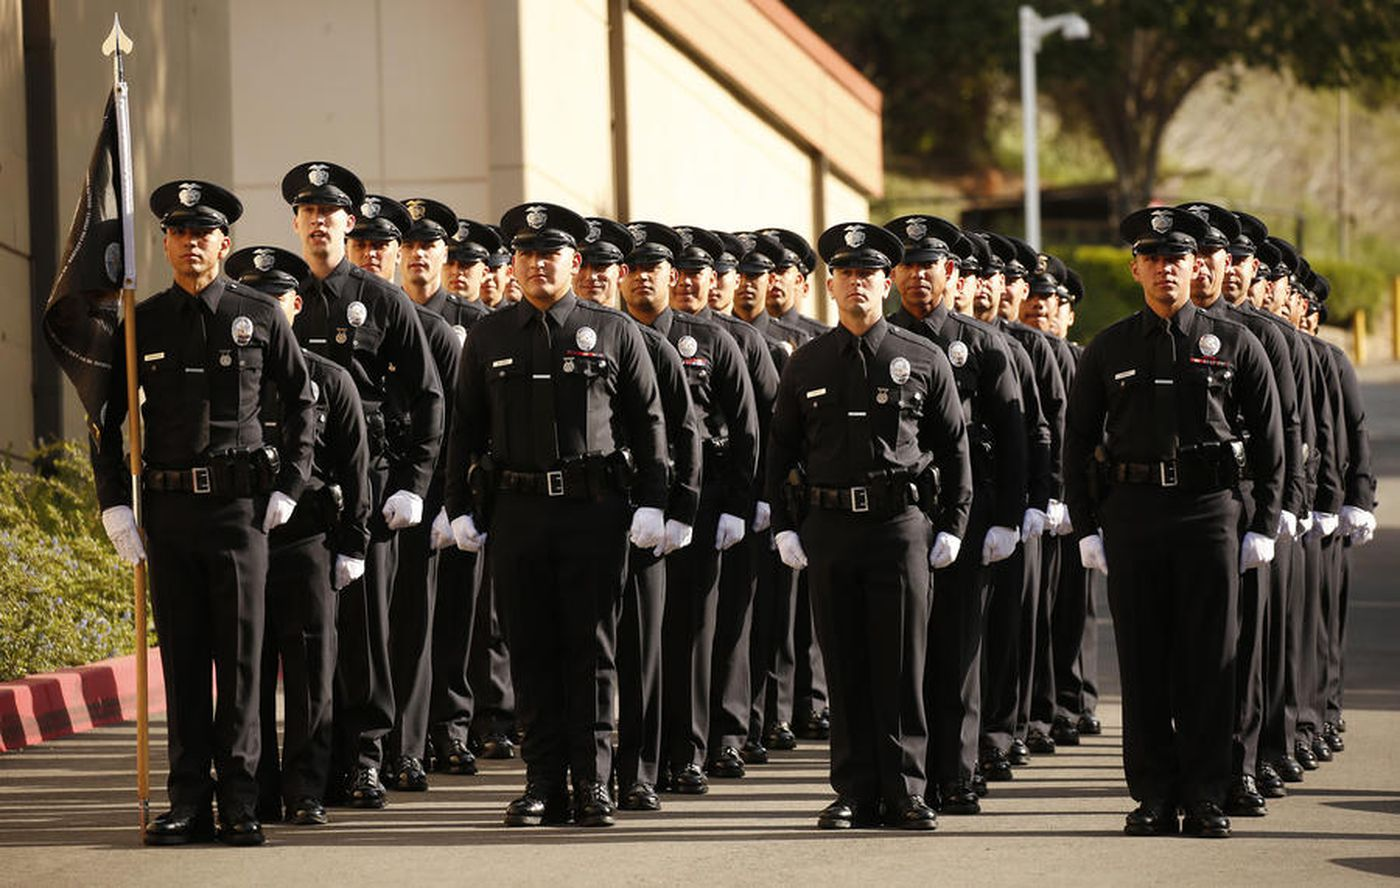 2018年4月,洛杉矶警察局的新兵在毕业典礼上。(Al Seib / Los Angeles Times)(photo:KTLA)